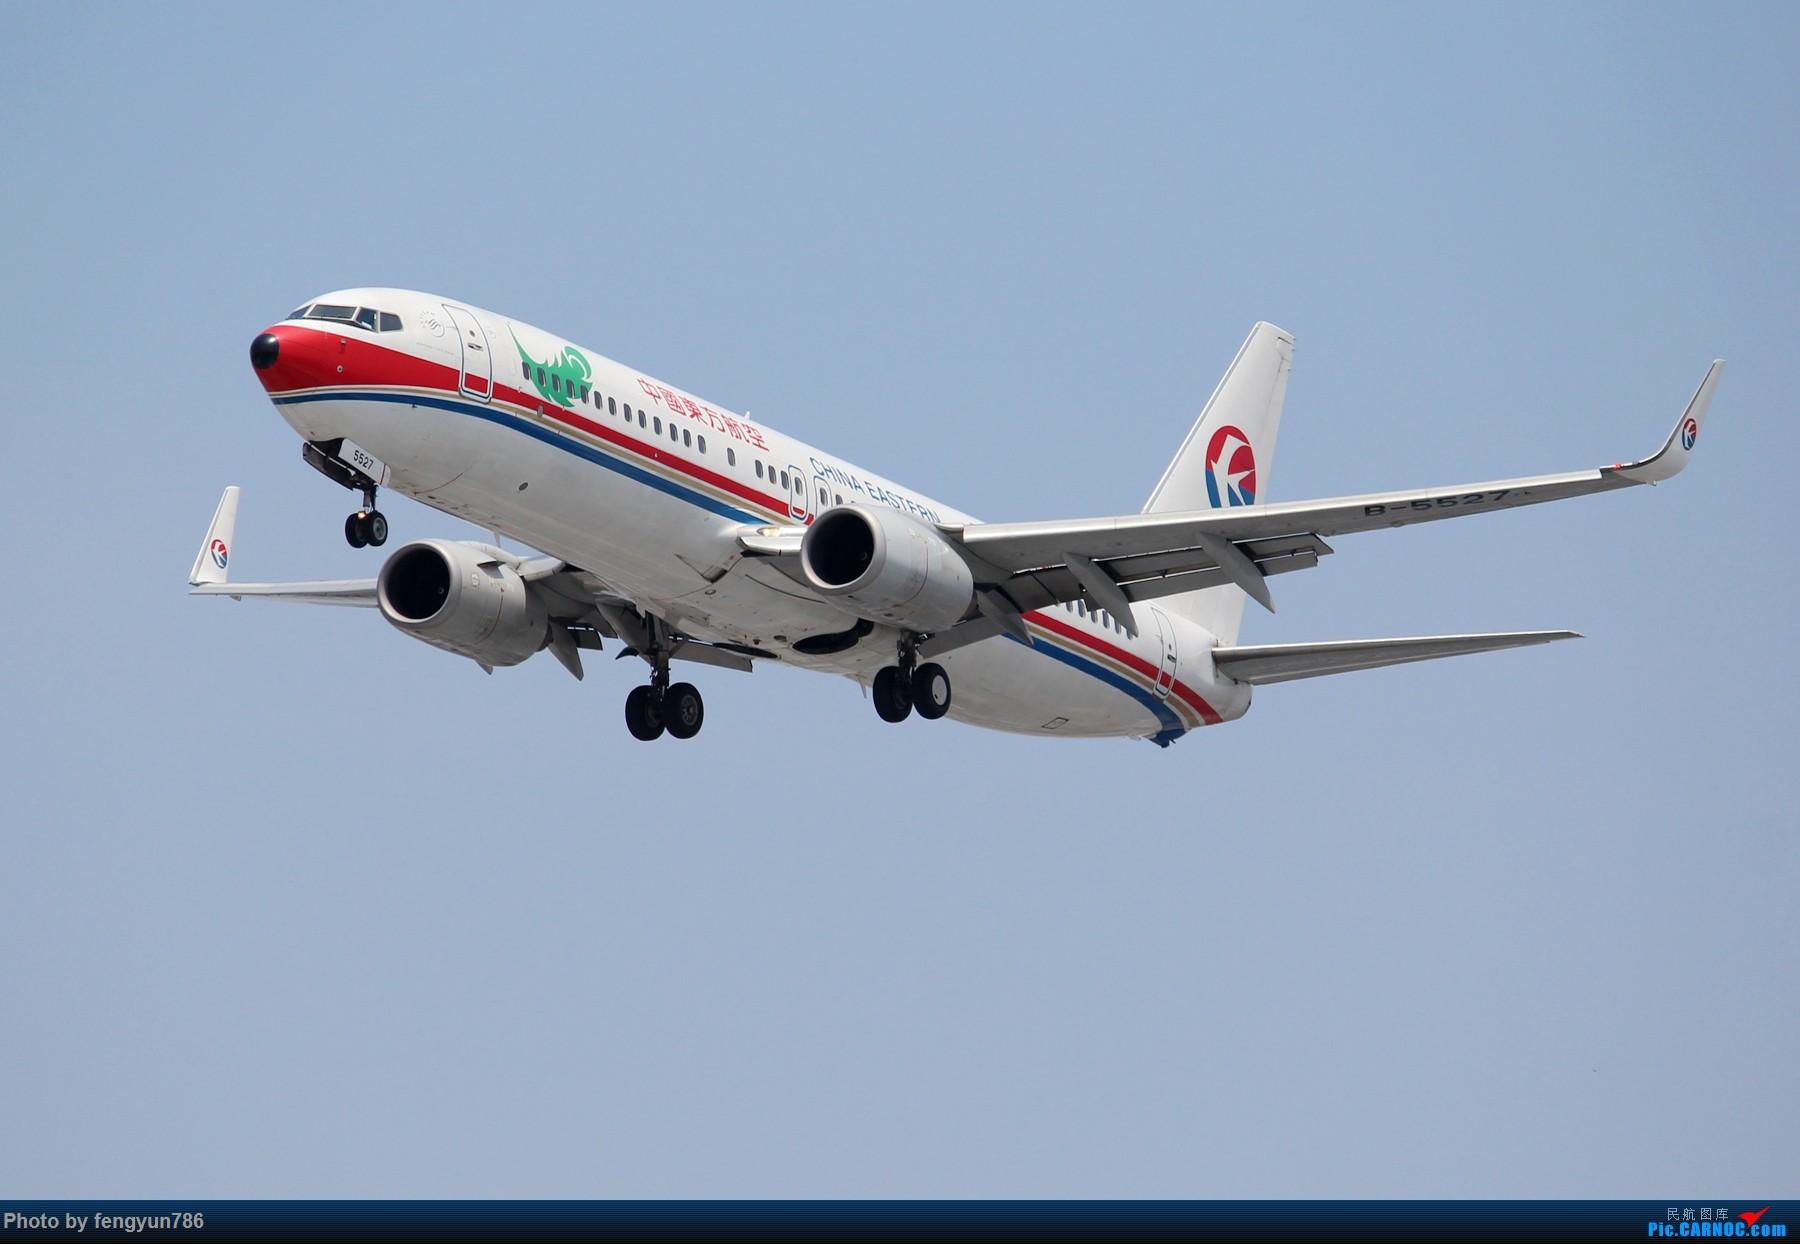 Re:[原创]7.19的SHA,天晴温高,发几个跟前一天不一样的。 BOEING 737-800 B-5527 中国上海虹桥国际机场